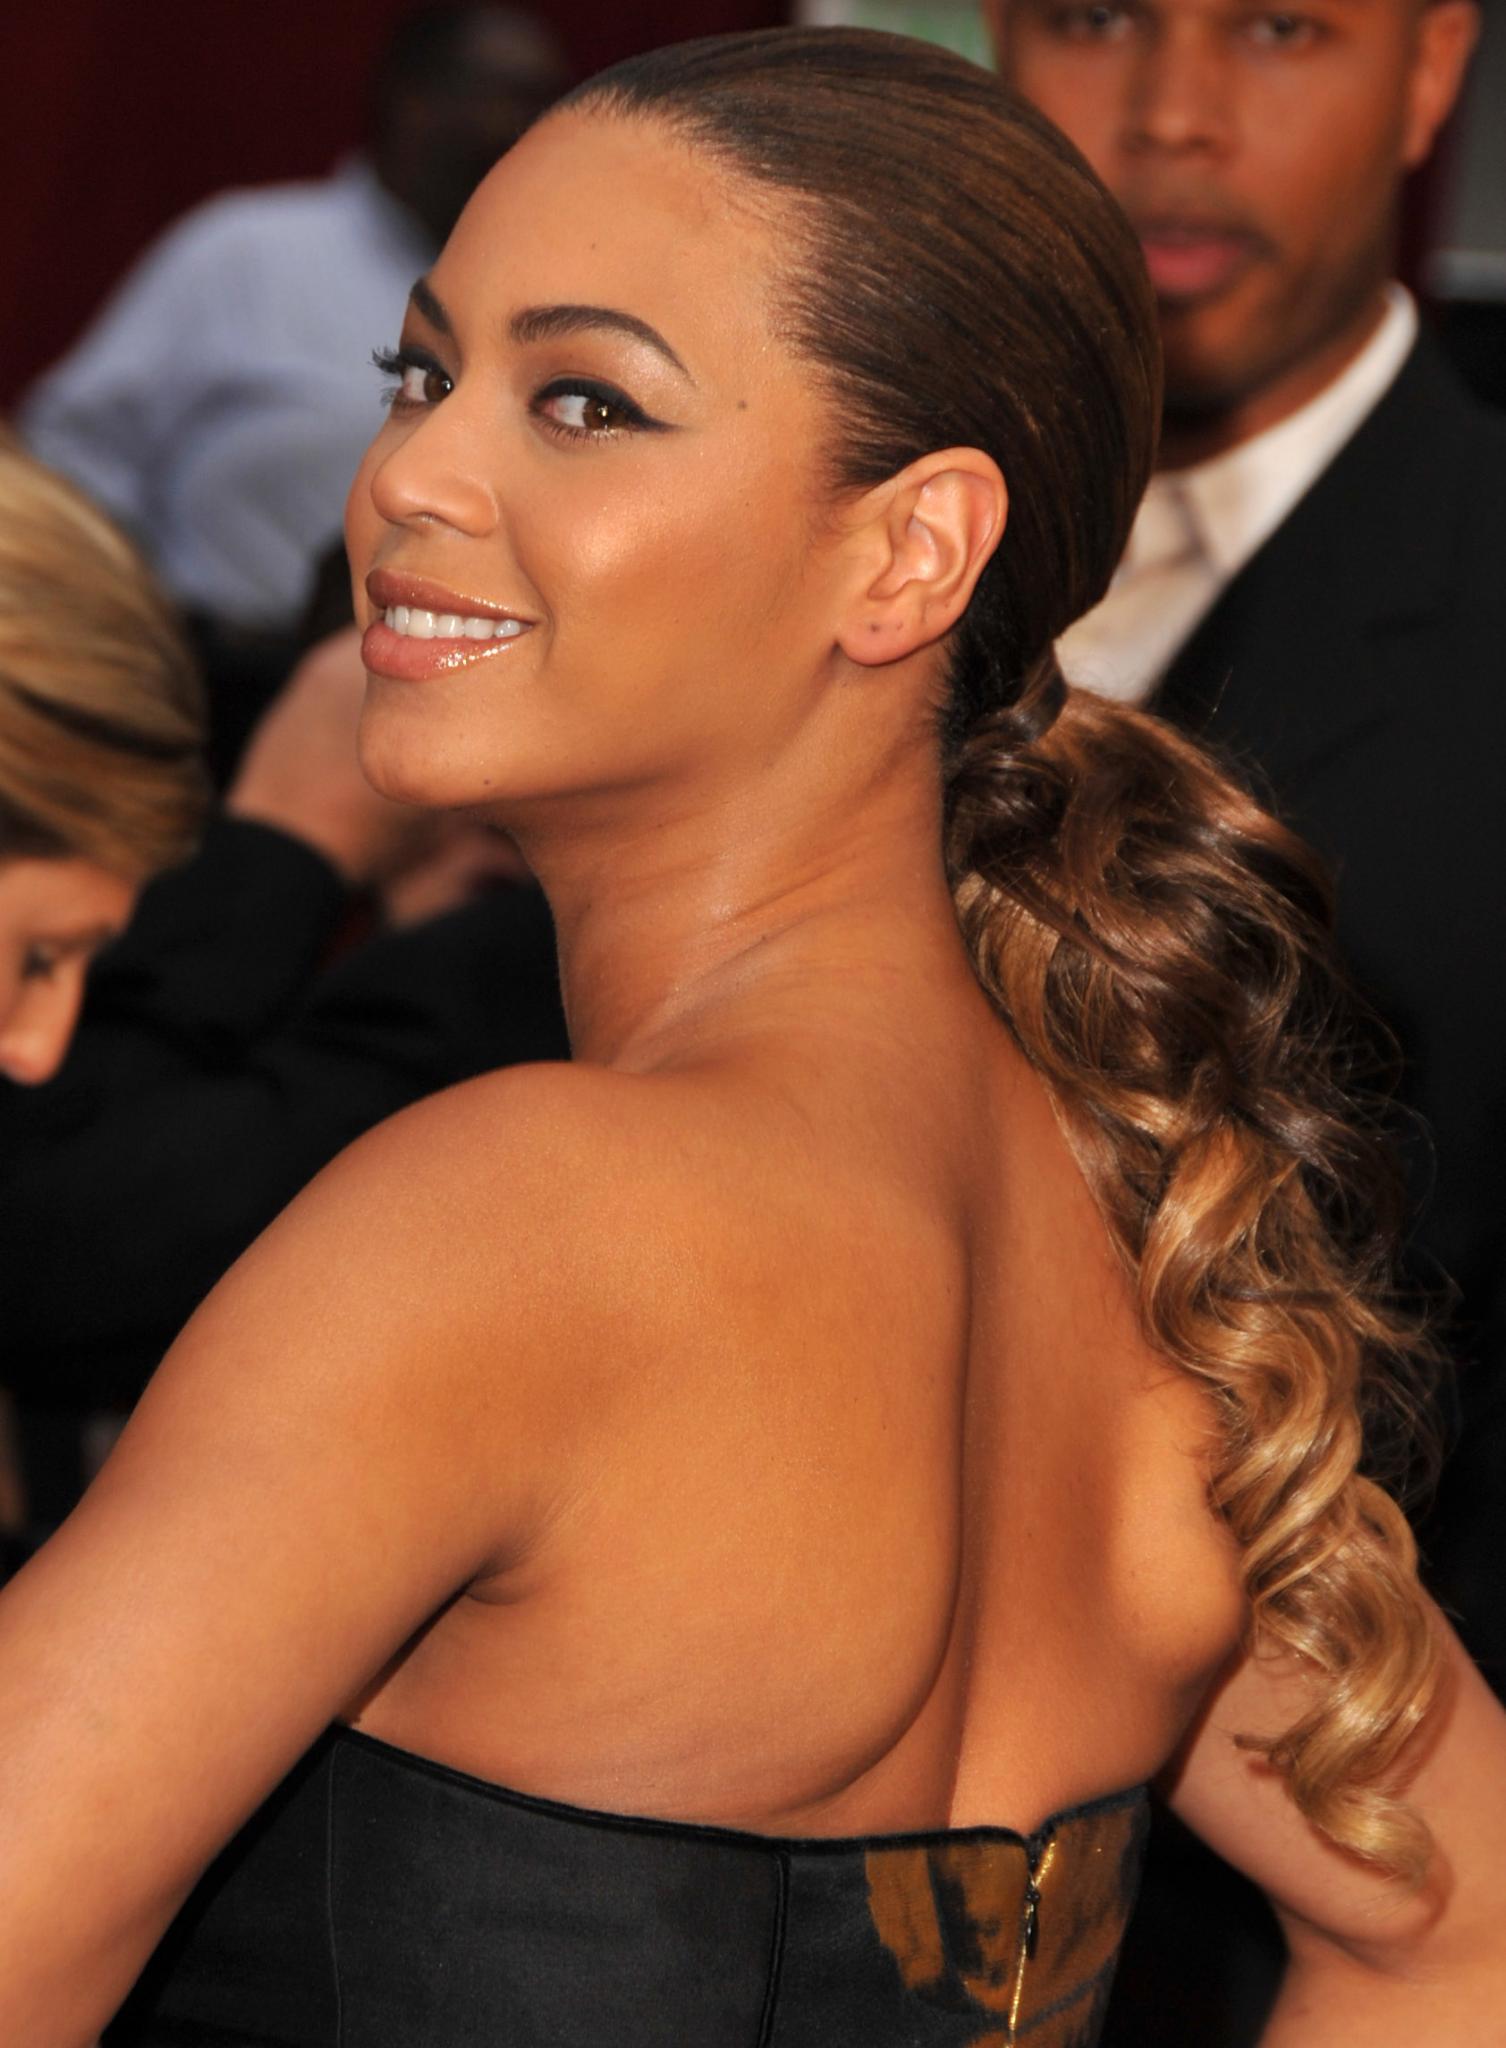 Beyoncé Tops Bing's 2013 Most-Searched Celebrity List